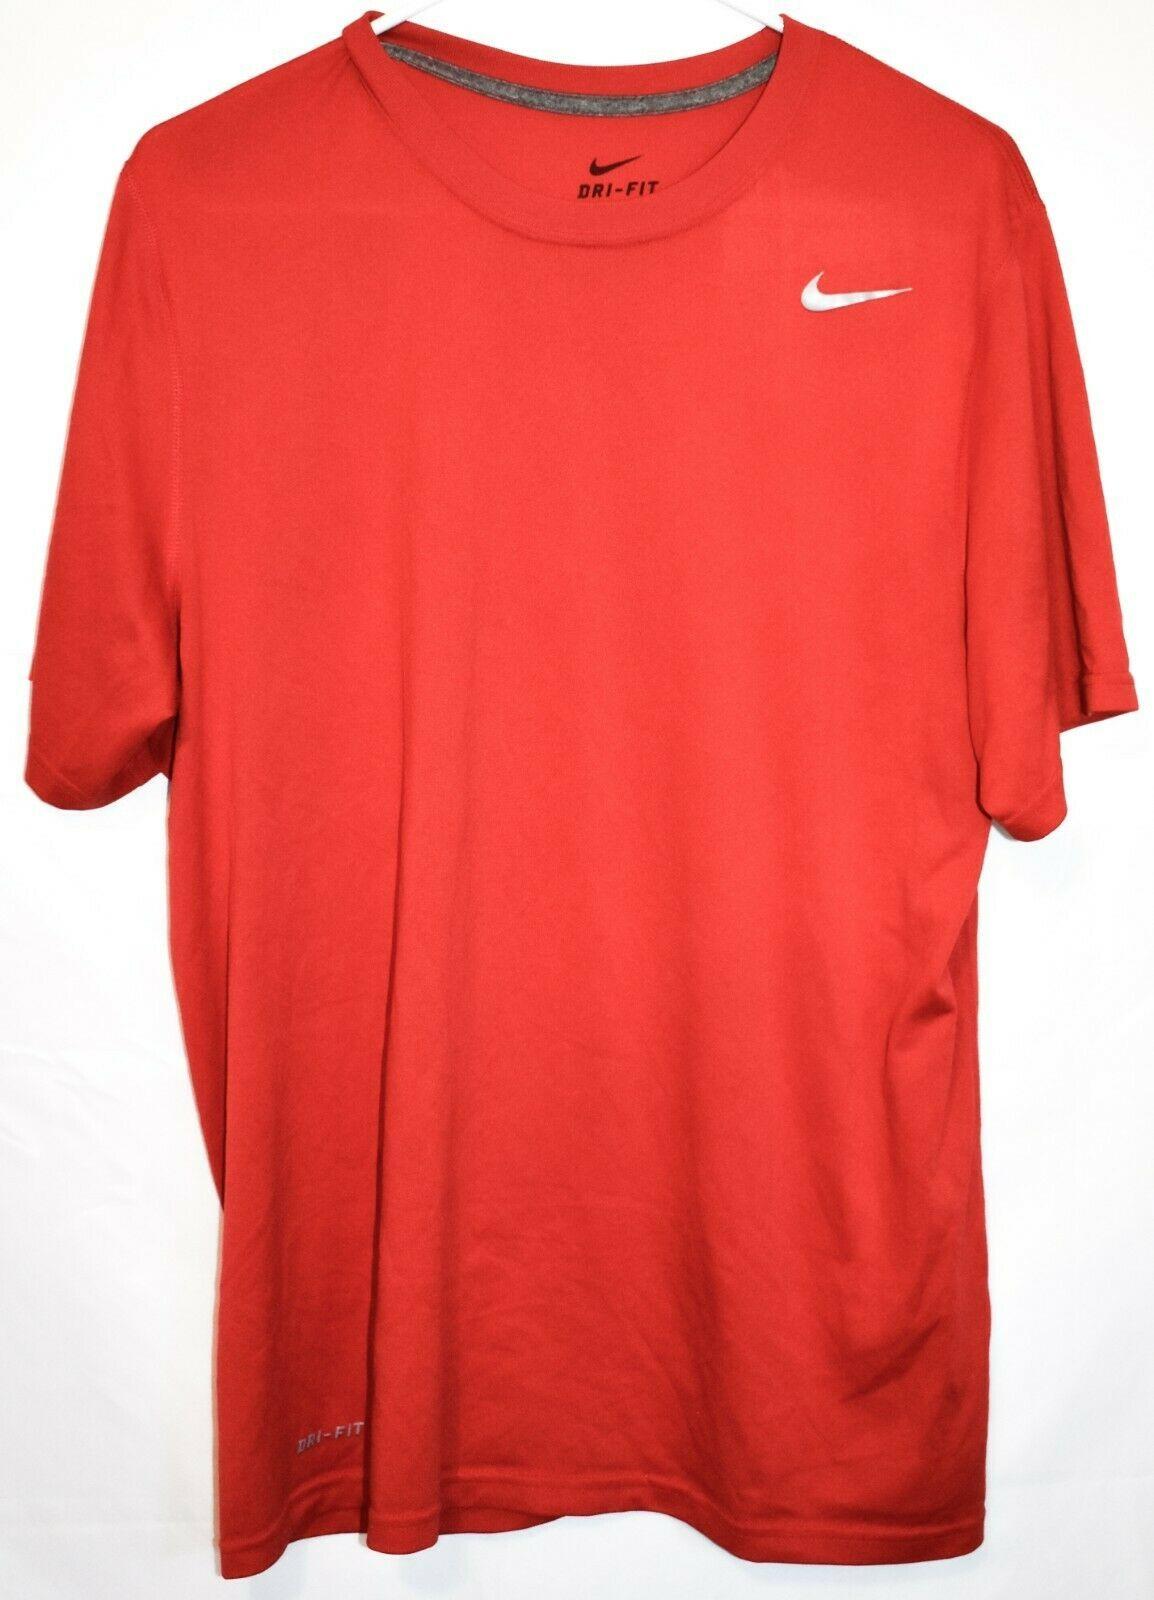 Nike Dri-Fit Men's Red Crew Neck Athletic Training Shirt Size L 384407-657